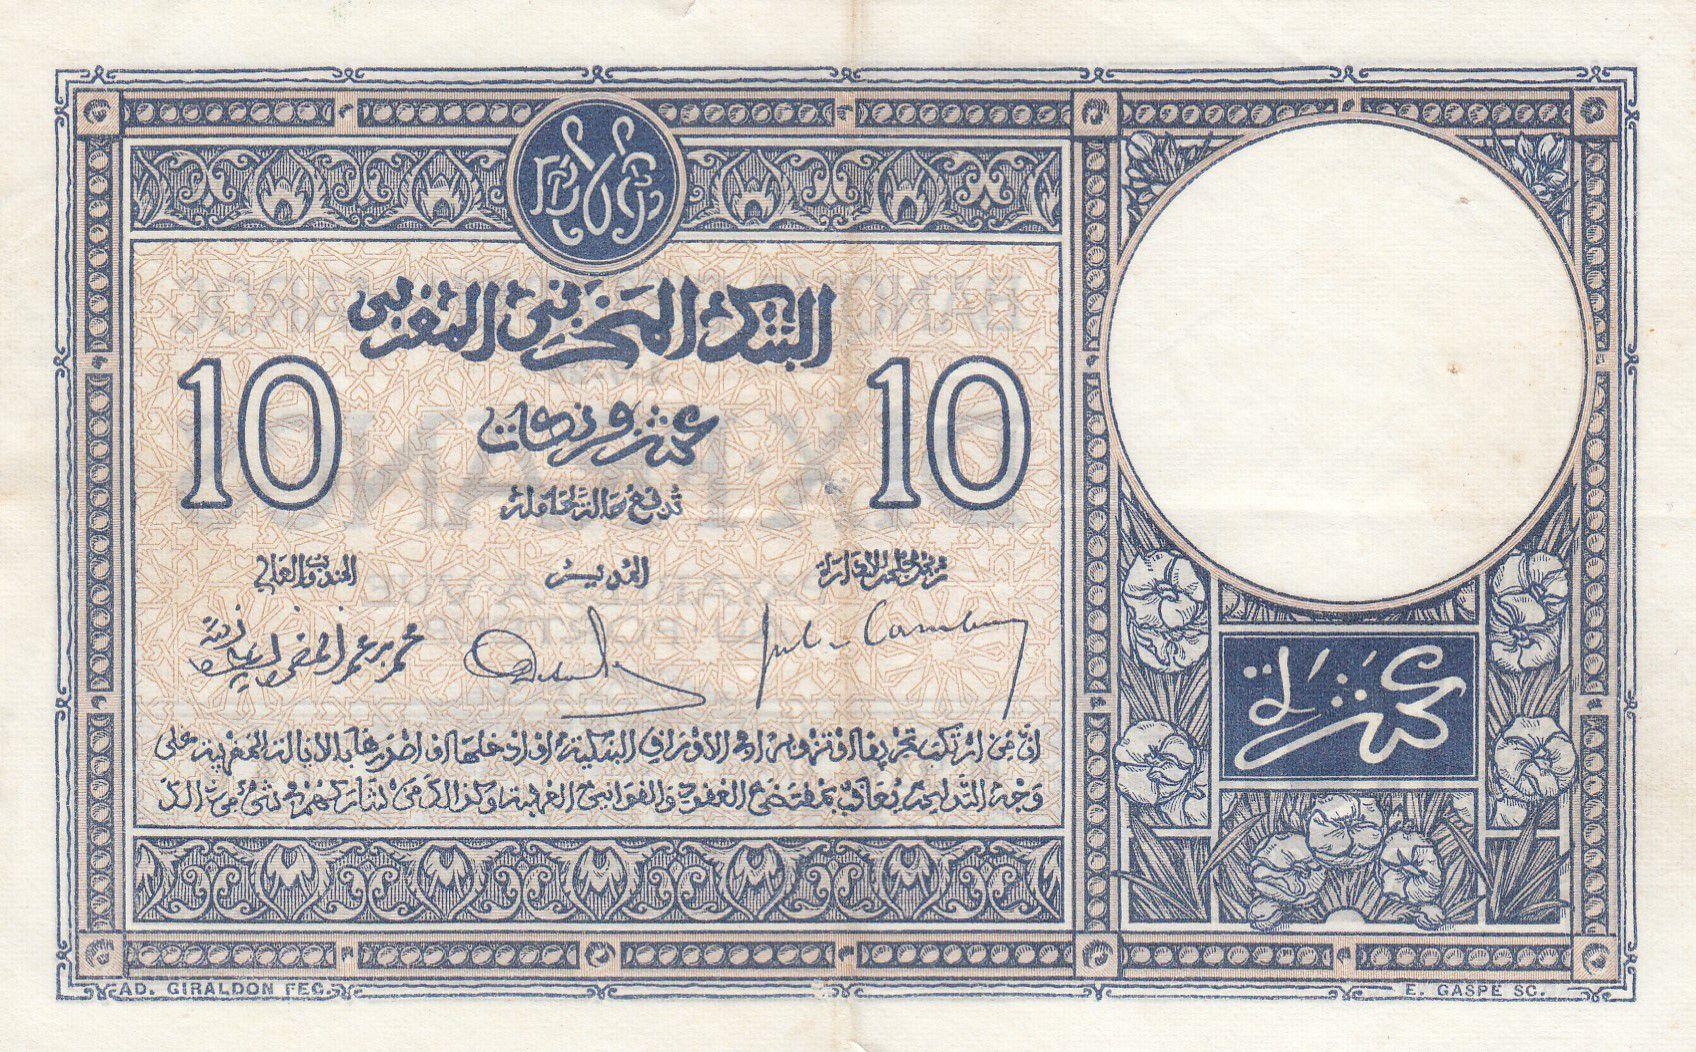 Maroc 10 Francs 01-07-1928 - TTB - Série M.914 - P.11b